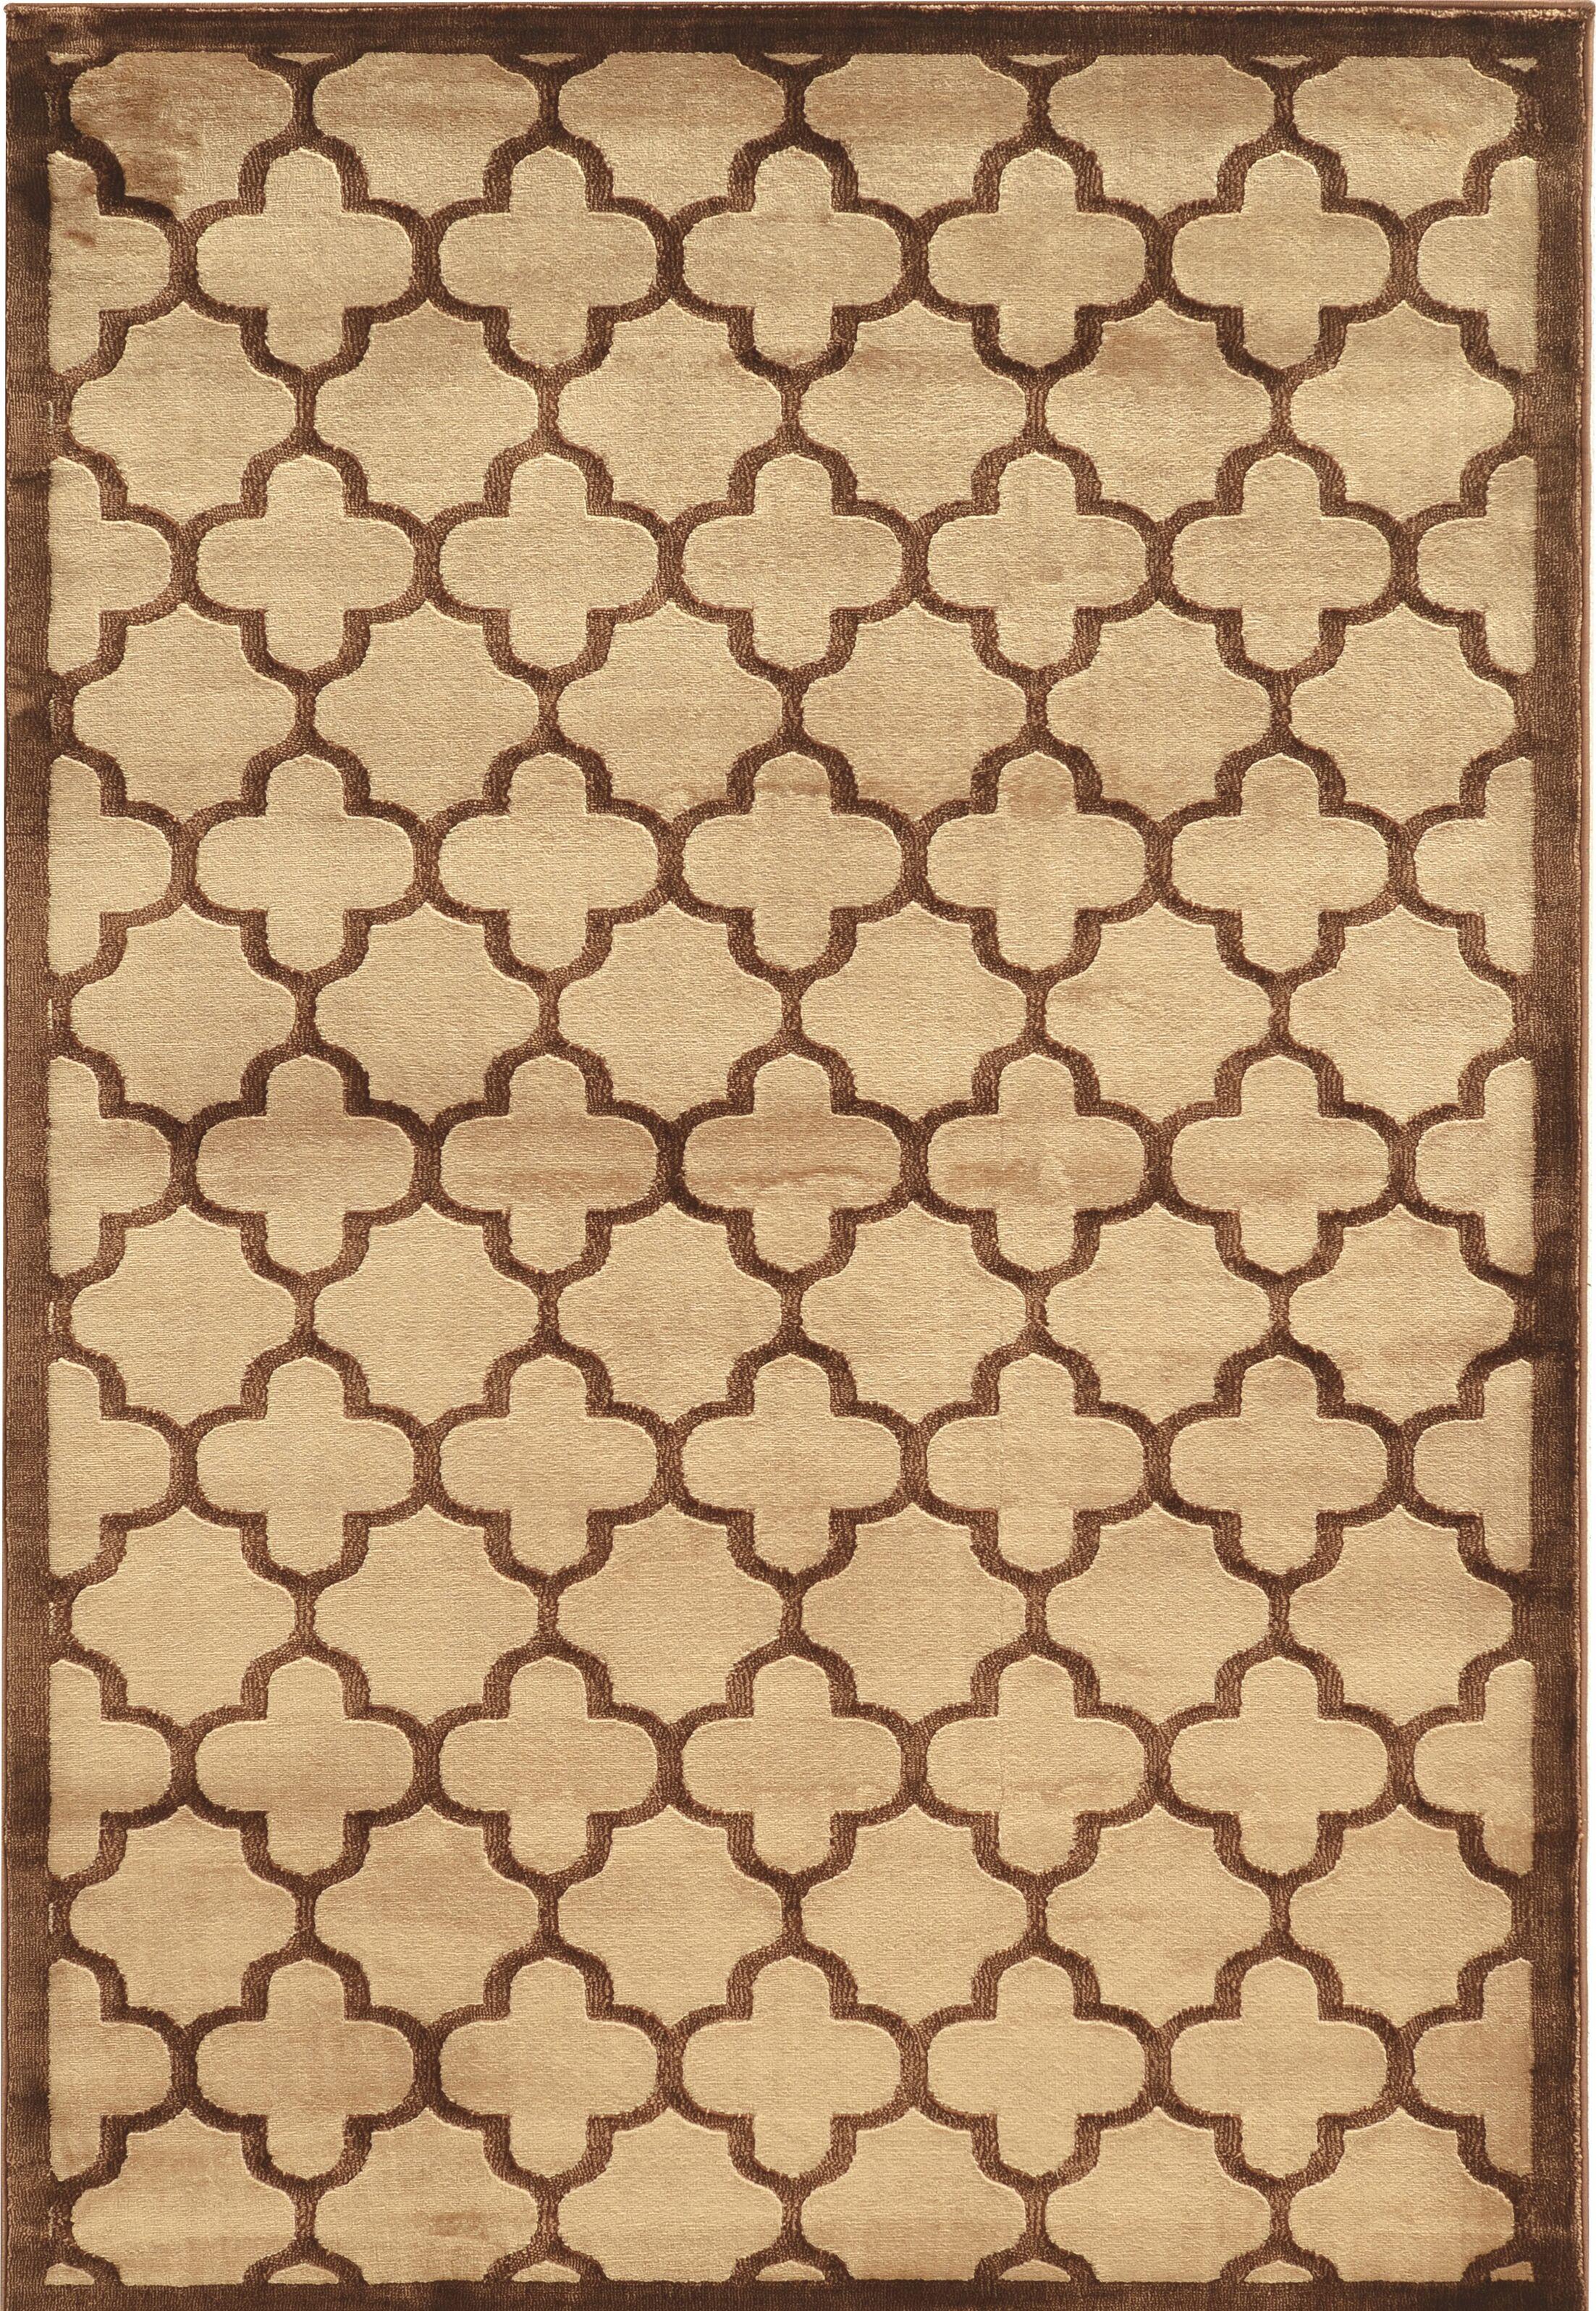 Belper Beige/Brown Area Rug Rug Size: Rectangle 5' x 7'6